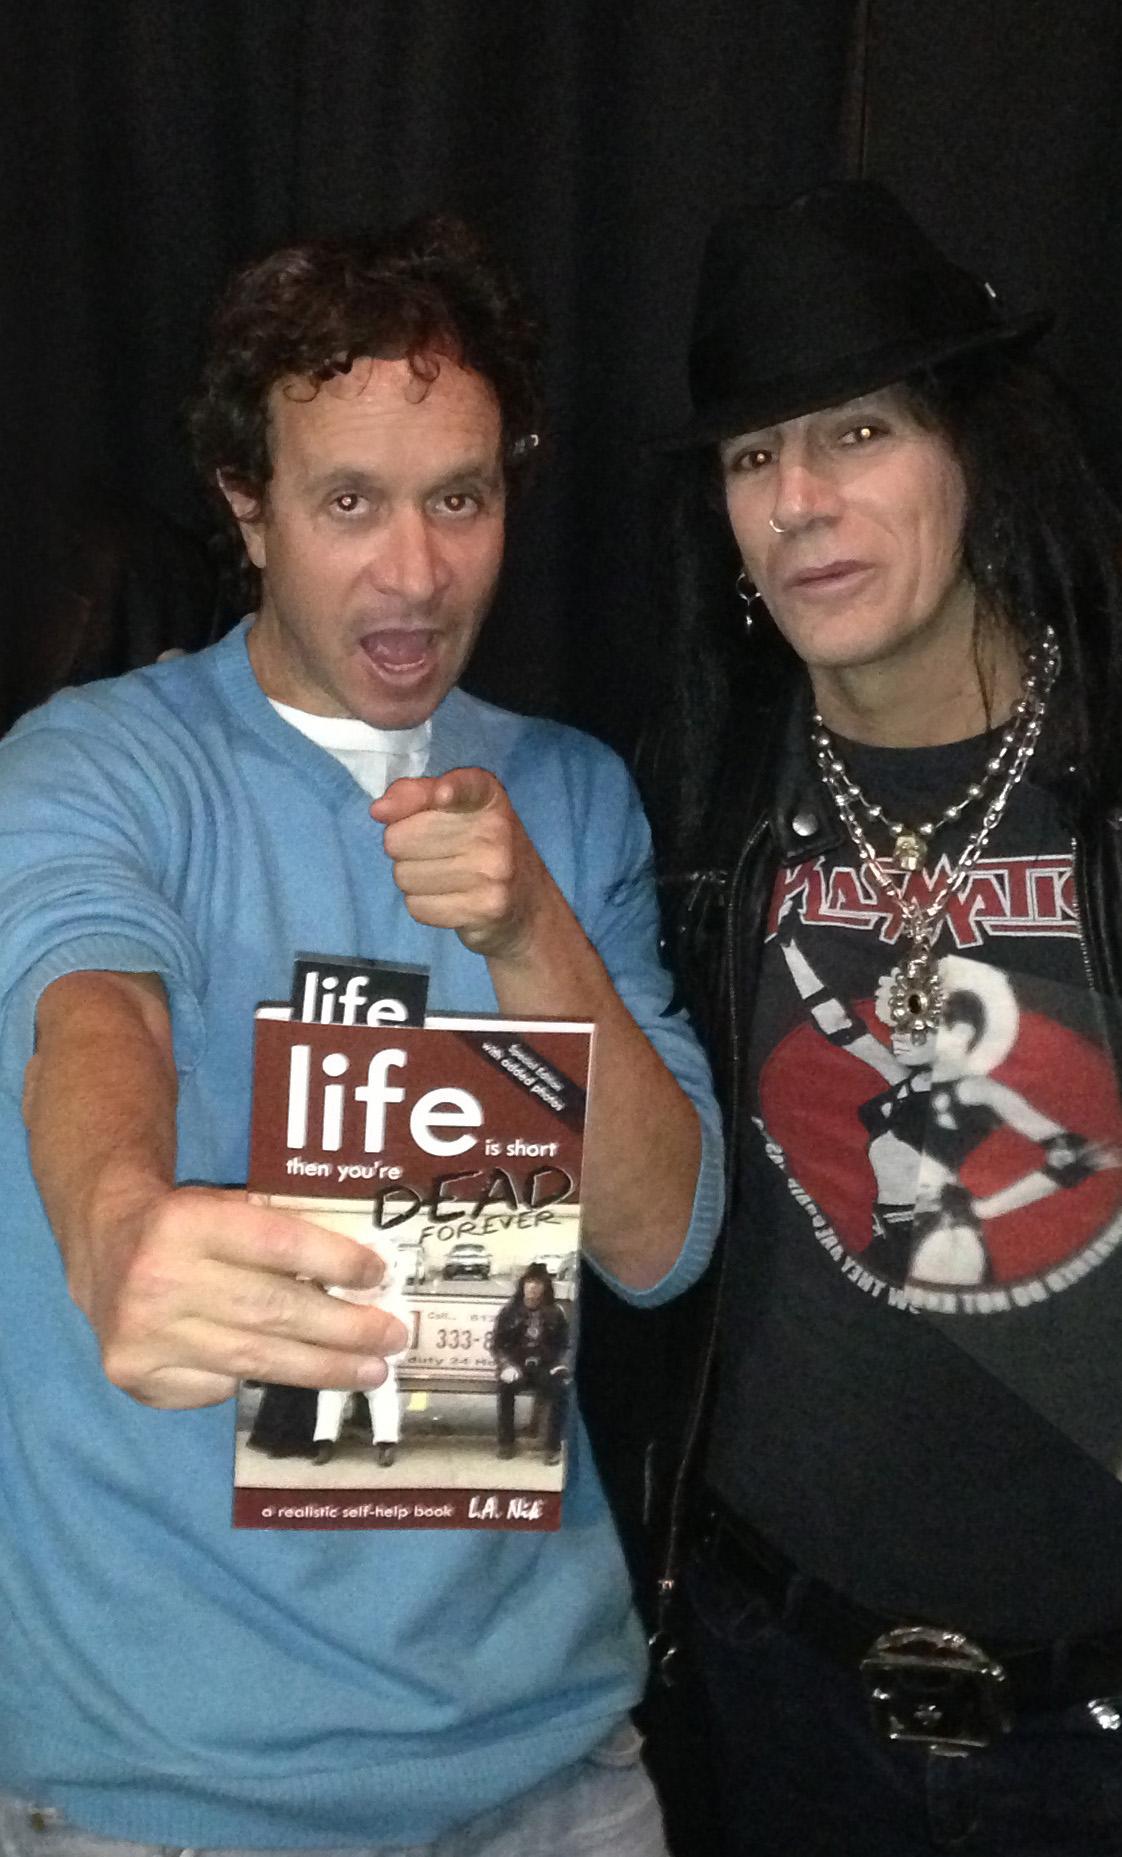 Pauly saying buy L.a. nike book!!